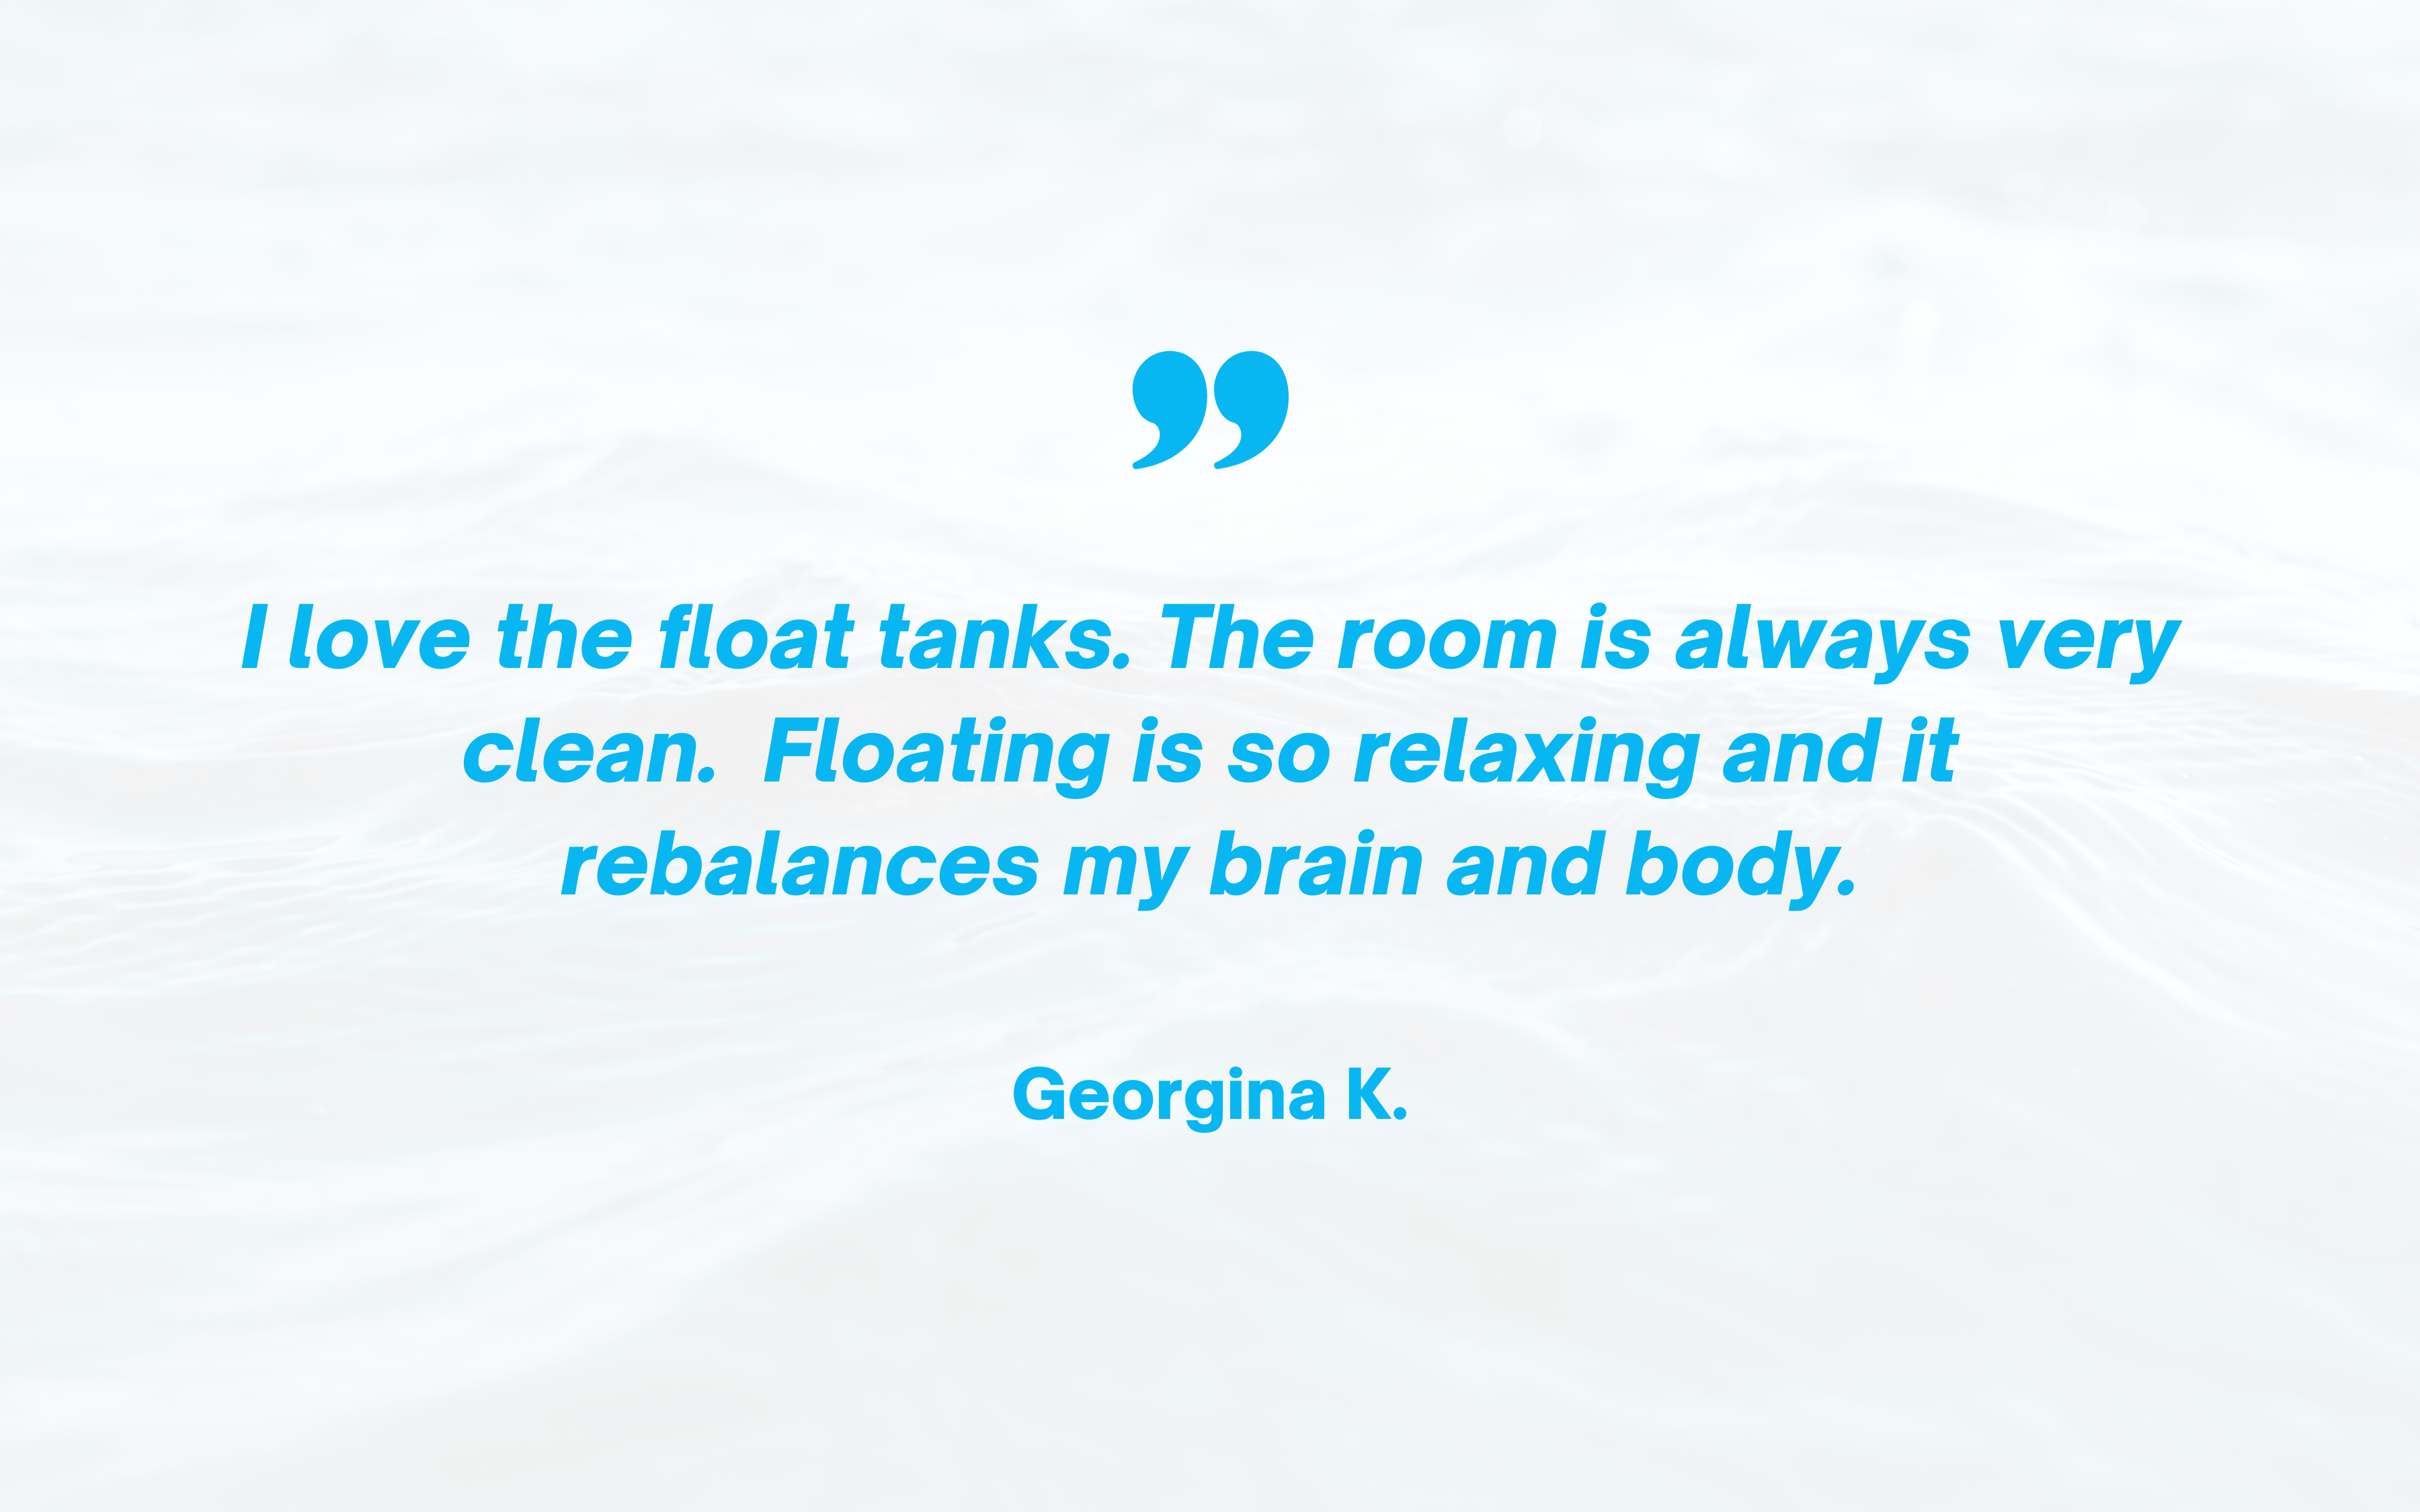 I love the float tanks